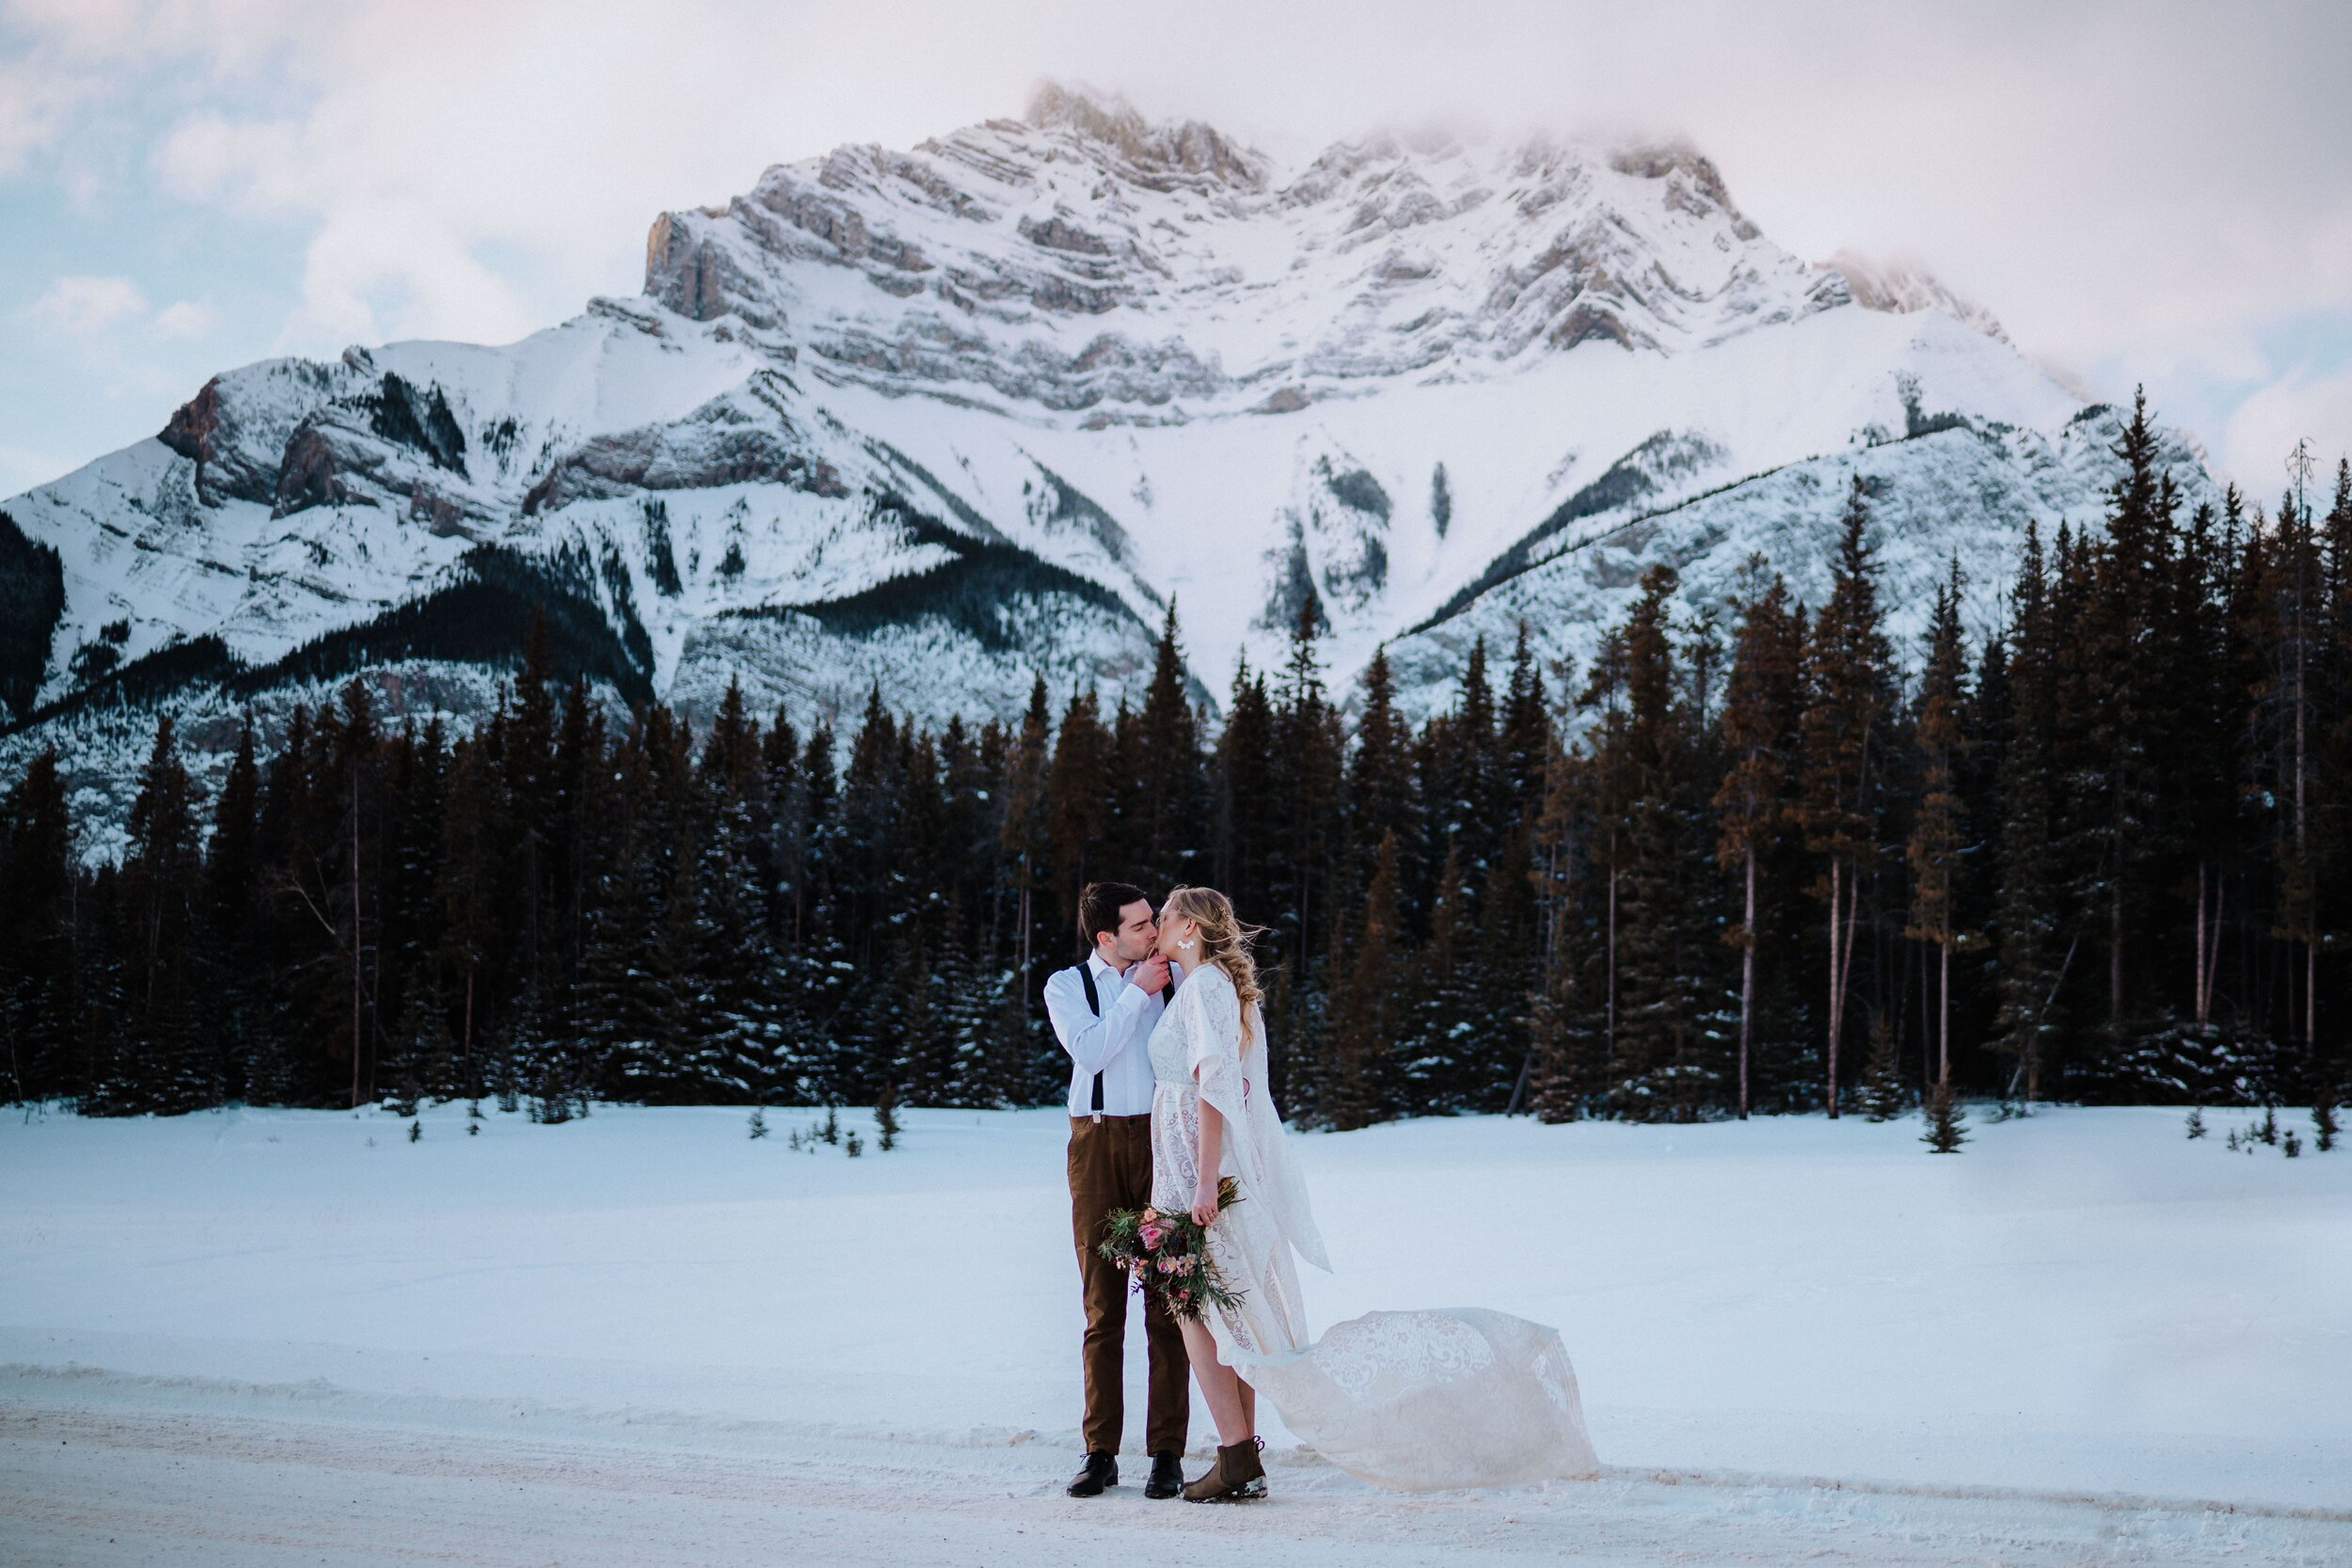 Small elopement at Lake Minnewanka Banff Alberta. Megan Maundrell Photography shares a few photos from this stunning intimate elopement.